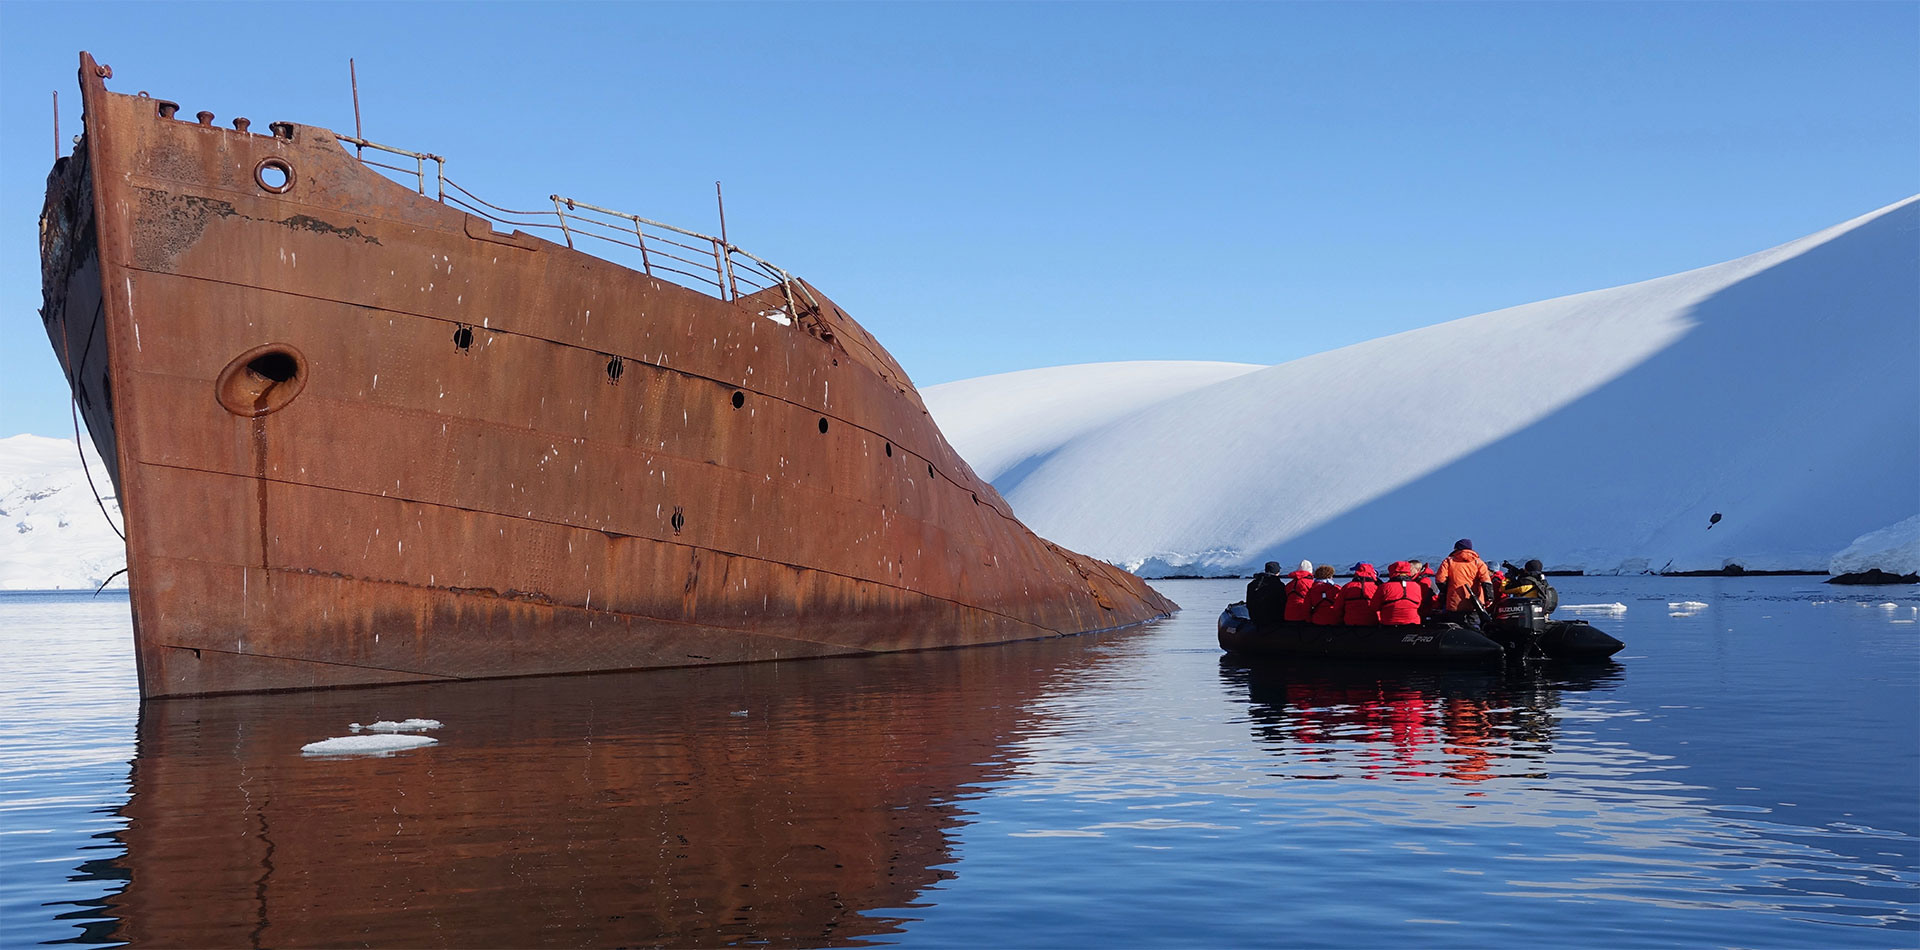 antarctica peninsula whale processing burnt ship